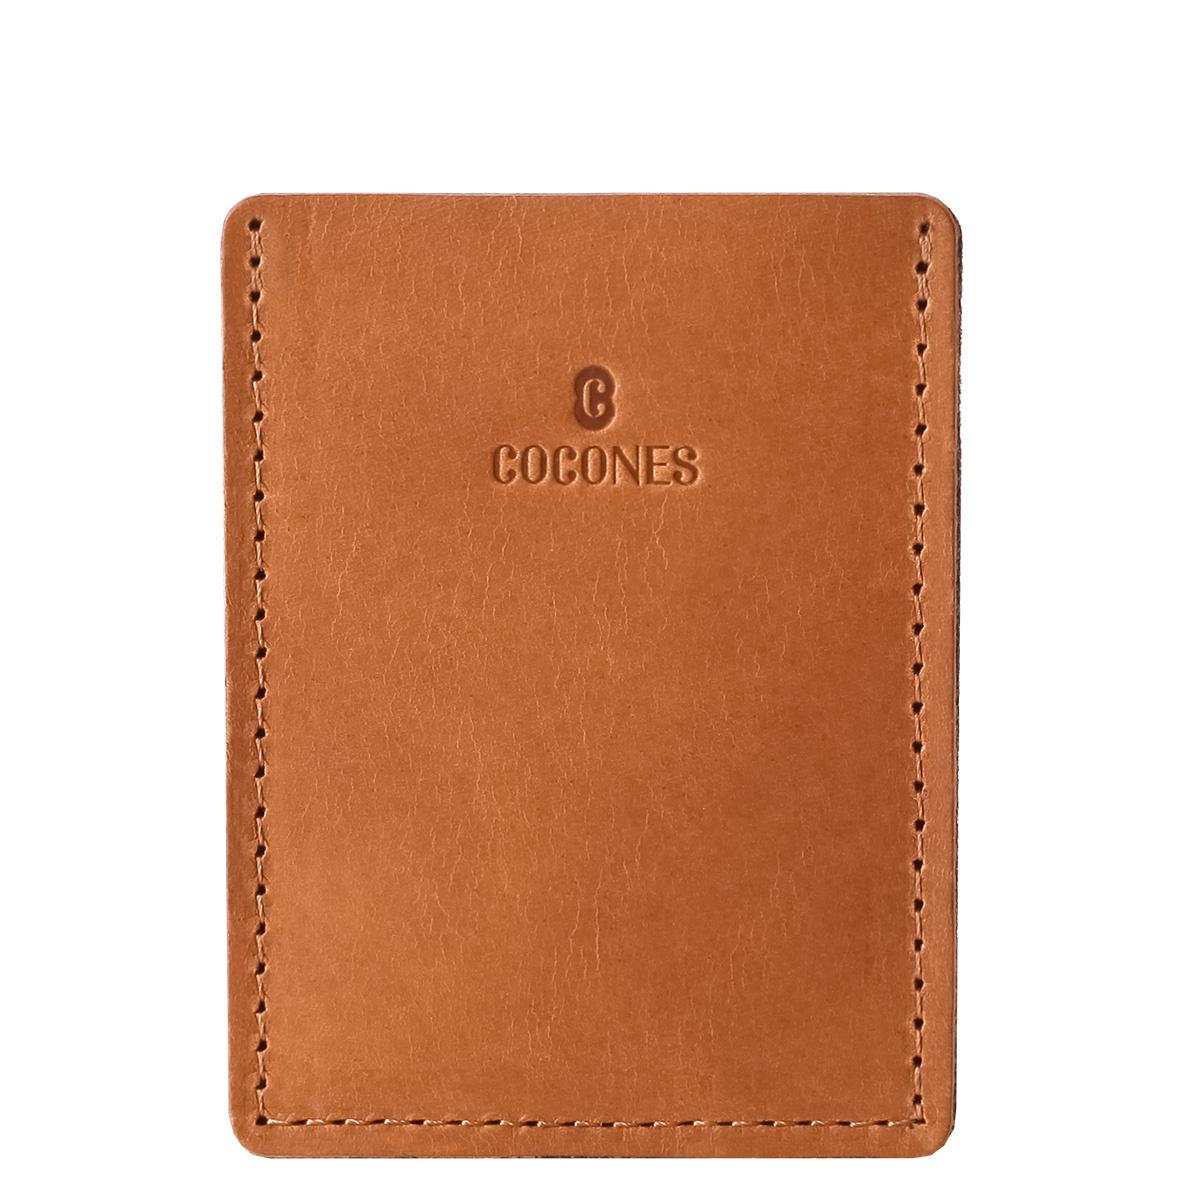 Card Wallet - Bruin